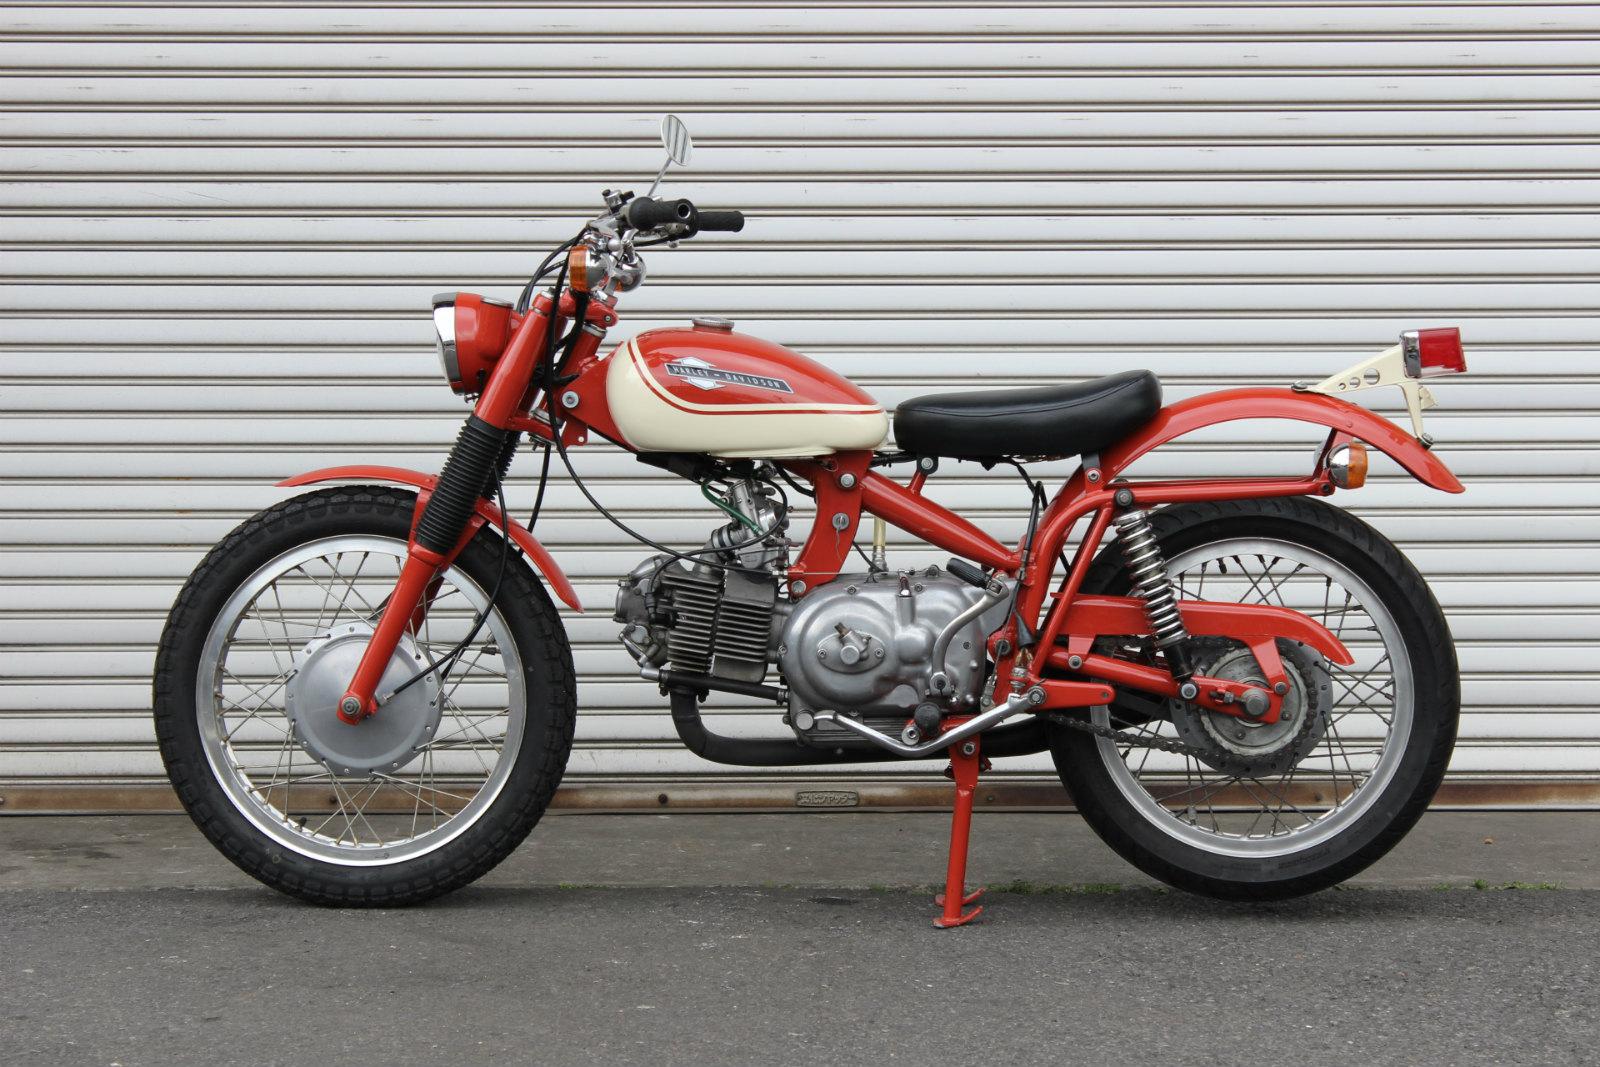 Harley Davidson Sprint_a0208987_14122986.jpg